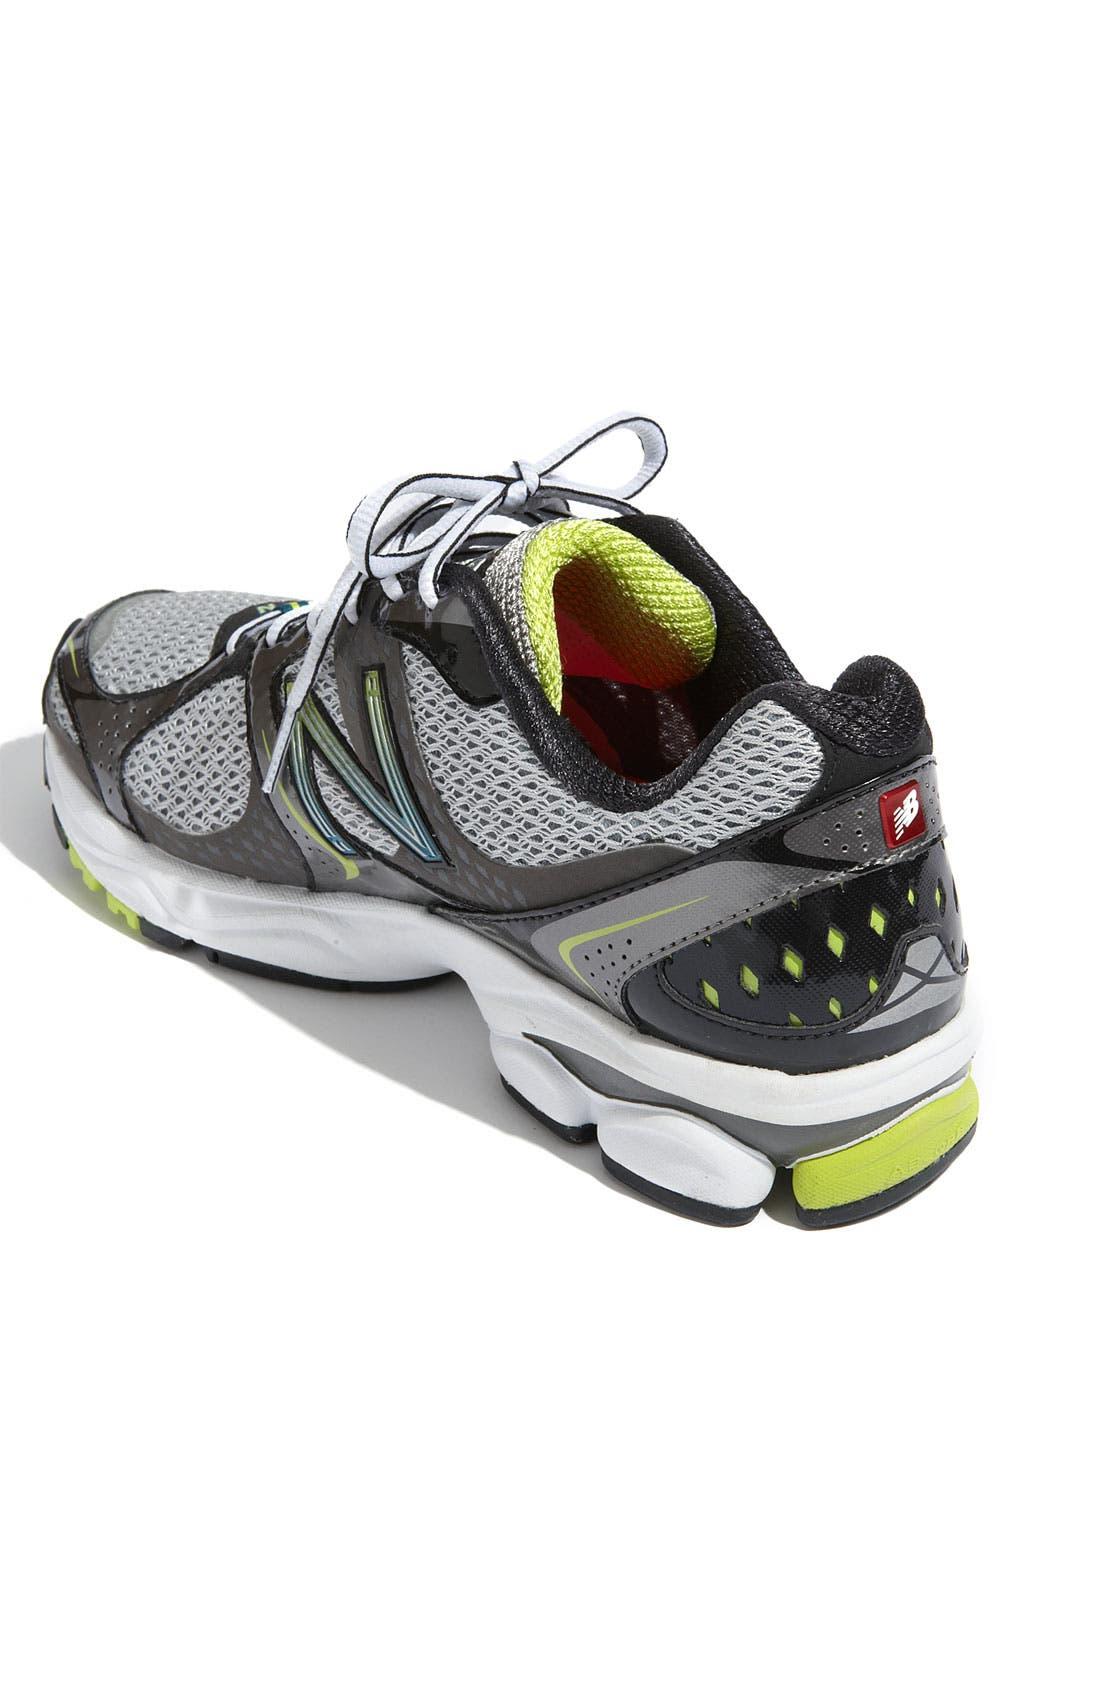 Alternate Image 2  - New Balance '1080' Running Shoe (Men)